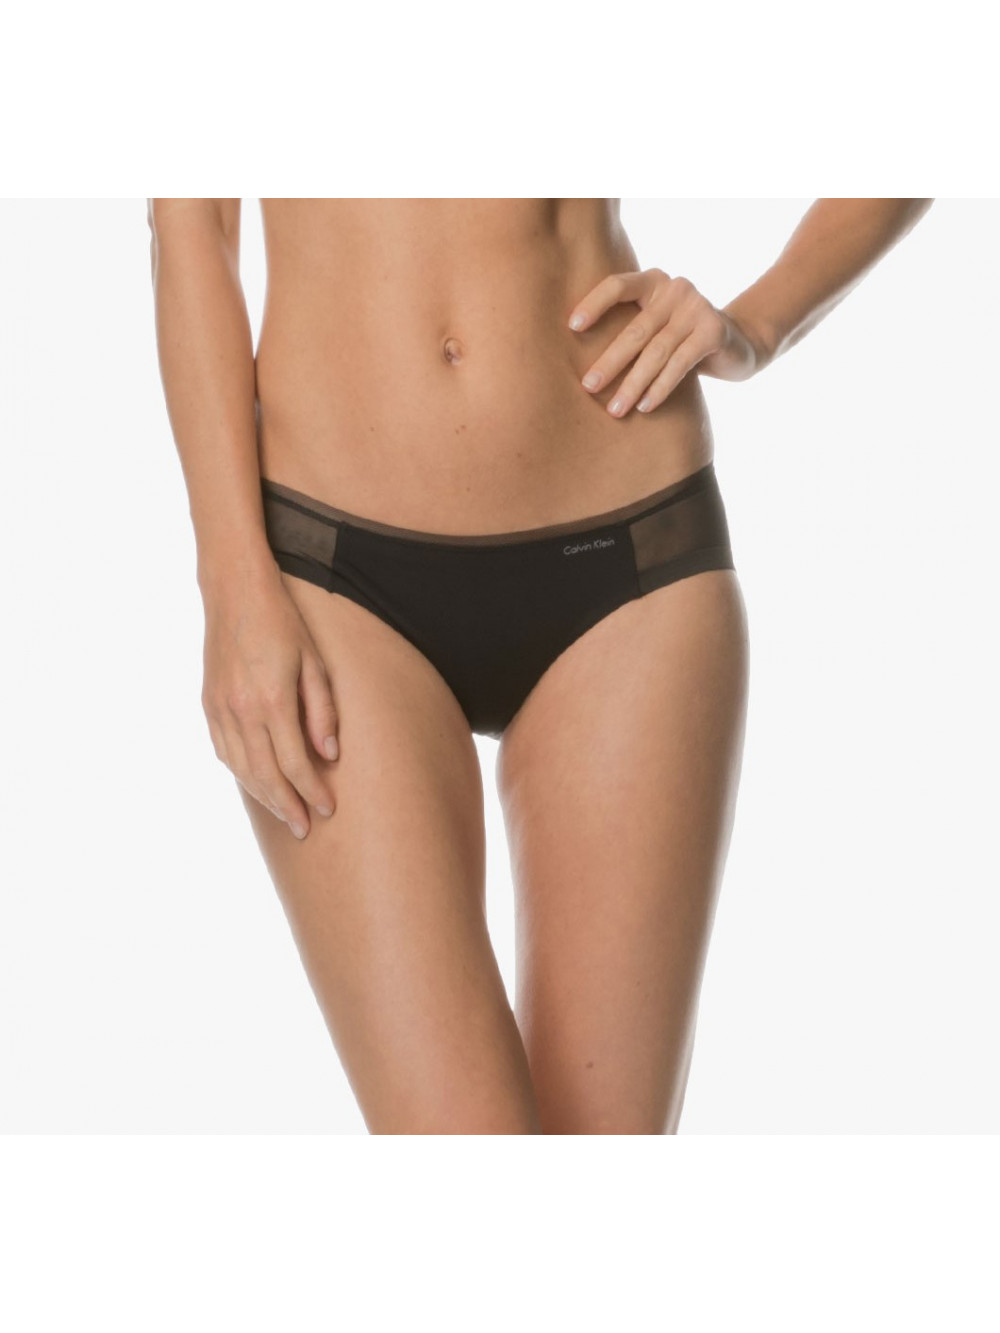 Dámske nohavičky Calvin Klein Sculpted Mesh Bikini čierne